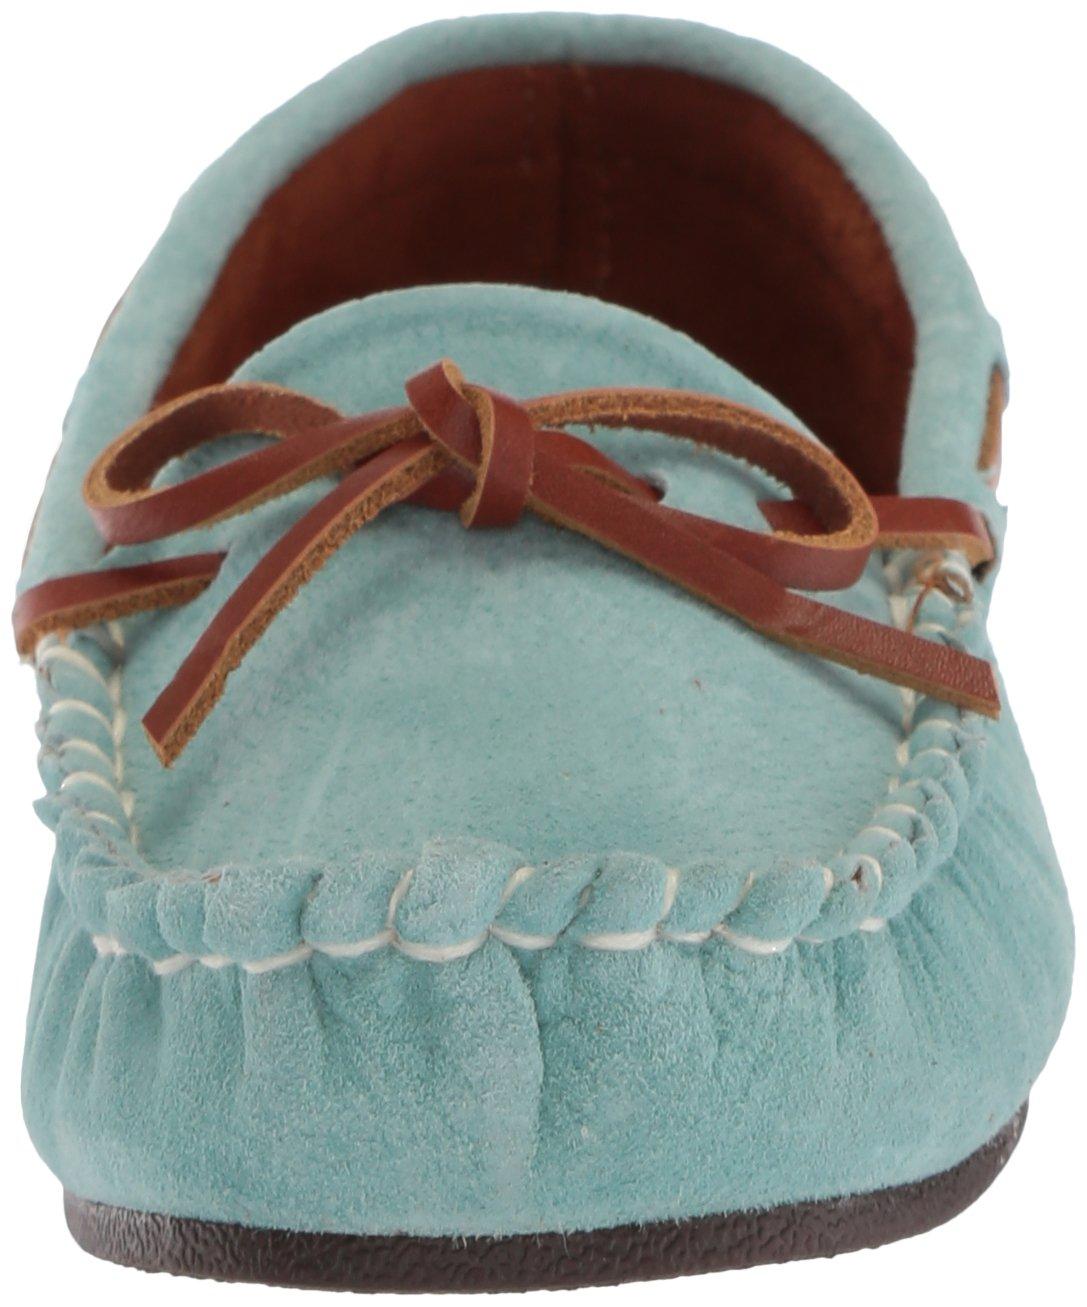 Lamo Women's Sabrina Moc II Shoe, Moccasin, Chestnut B01KMWTSYY 7.5 B(M) US|Mint